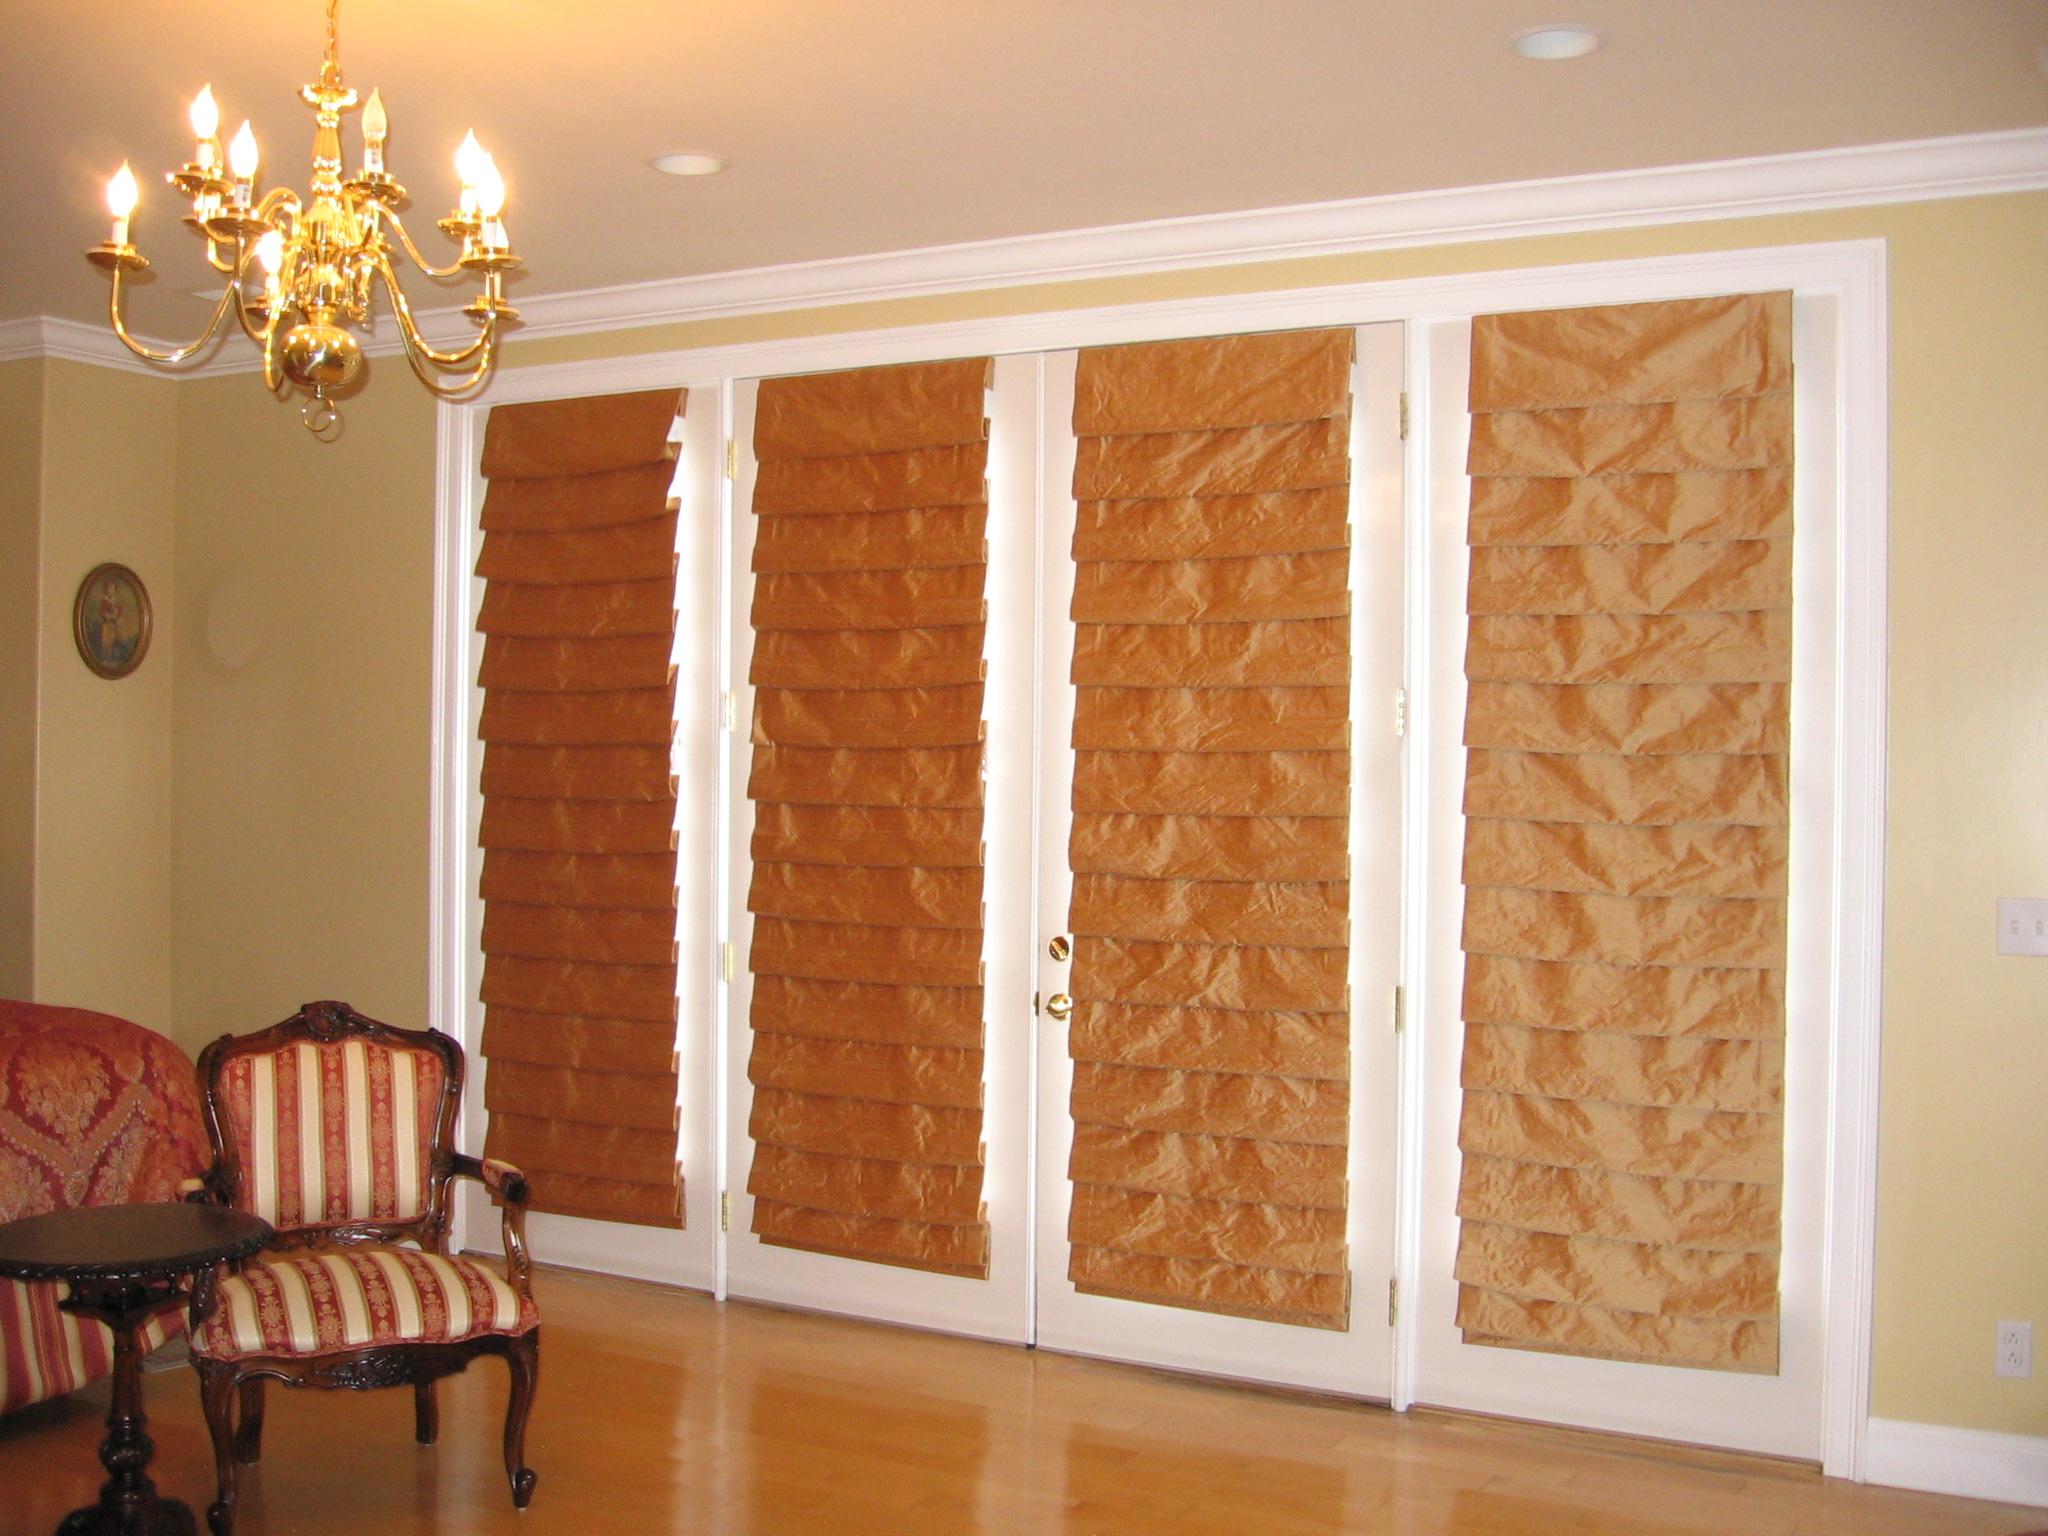 Soft Fold Roman Shades Window Treatments Shutters Wood Blinds Shades Bucks County Pa